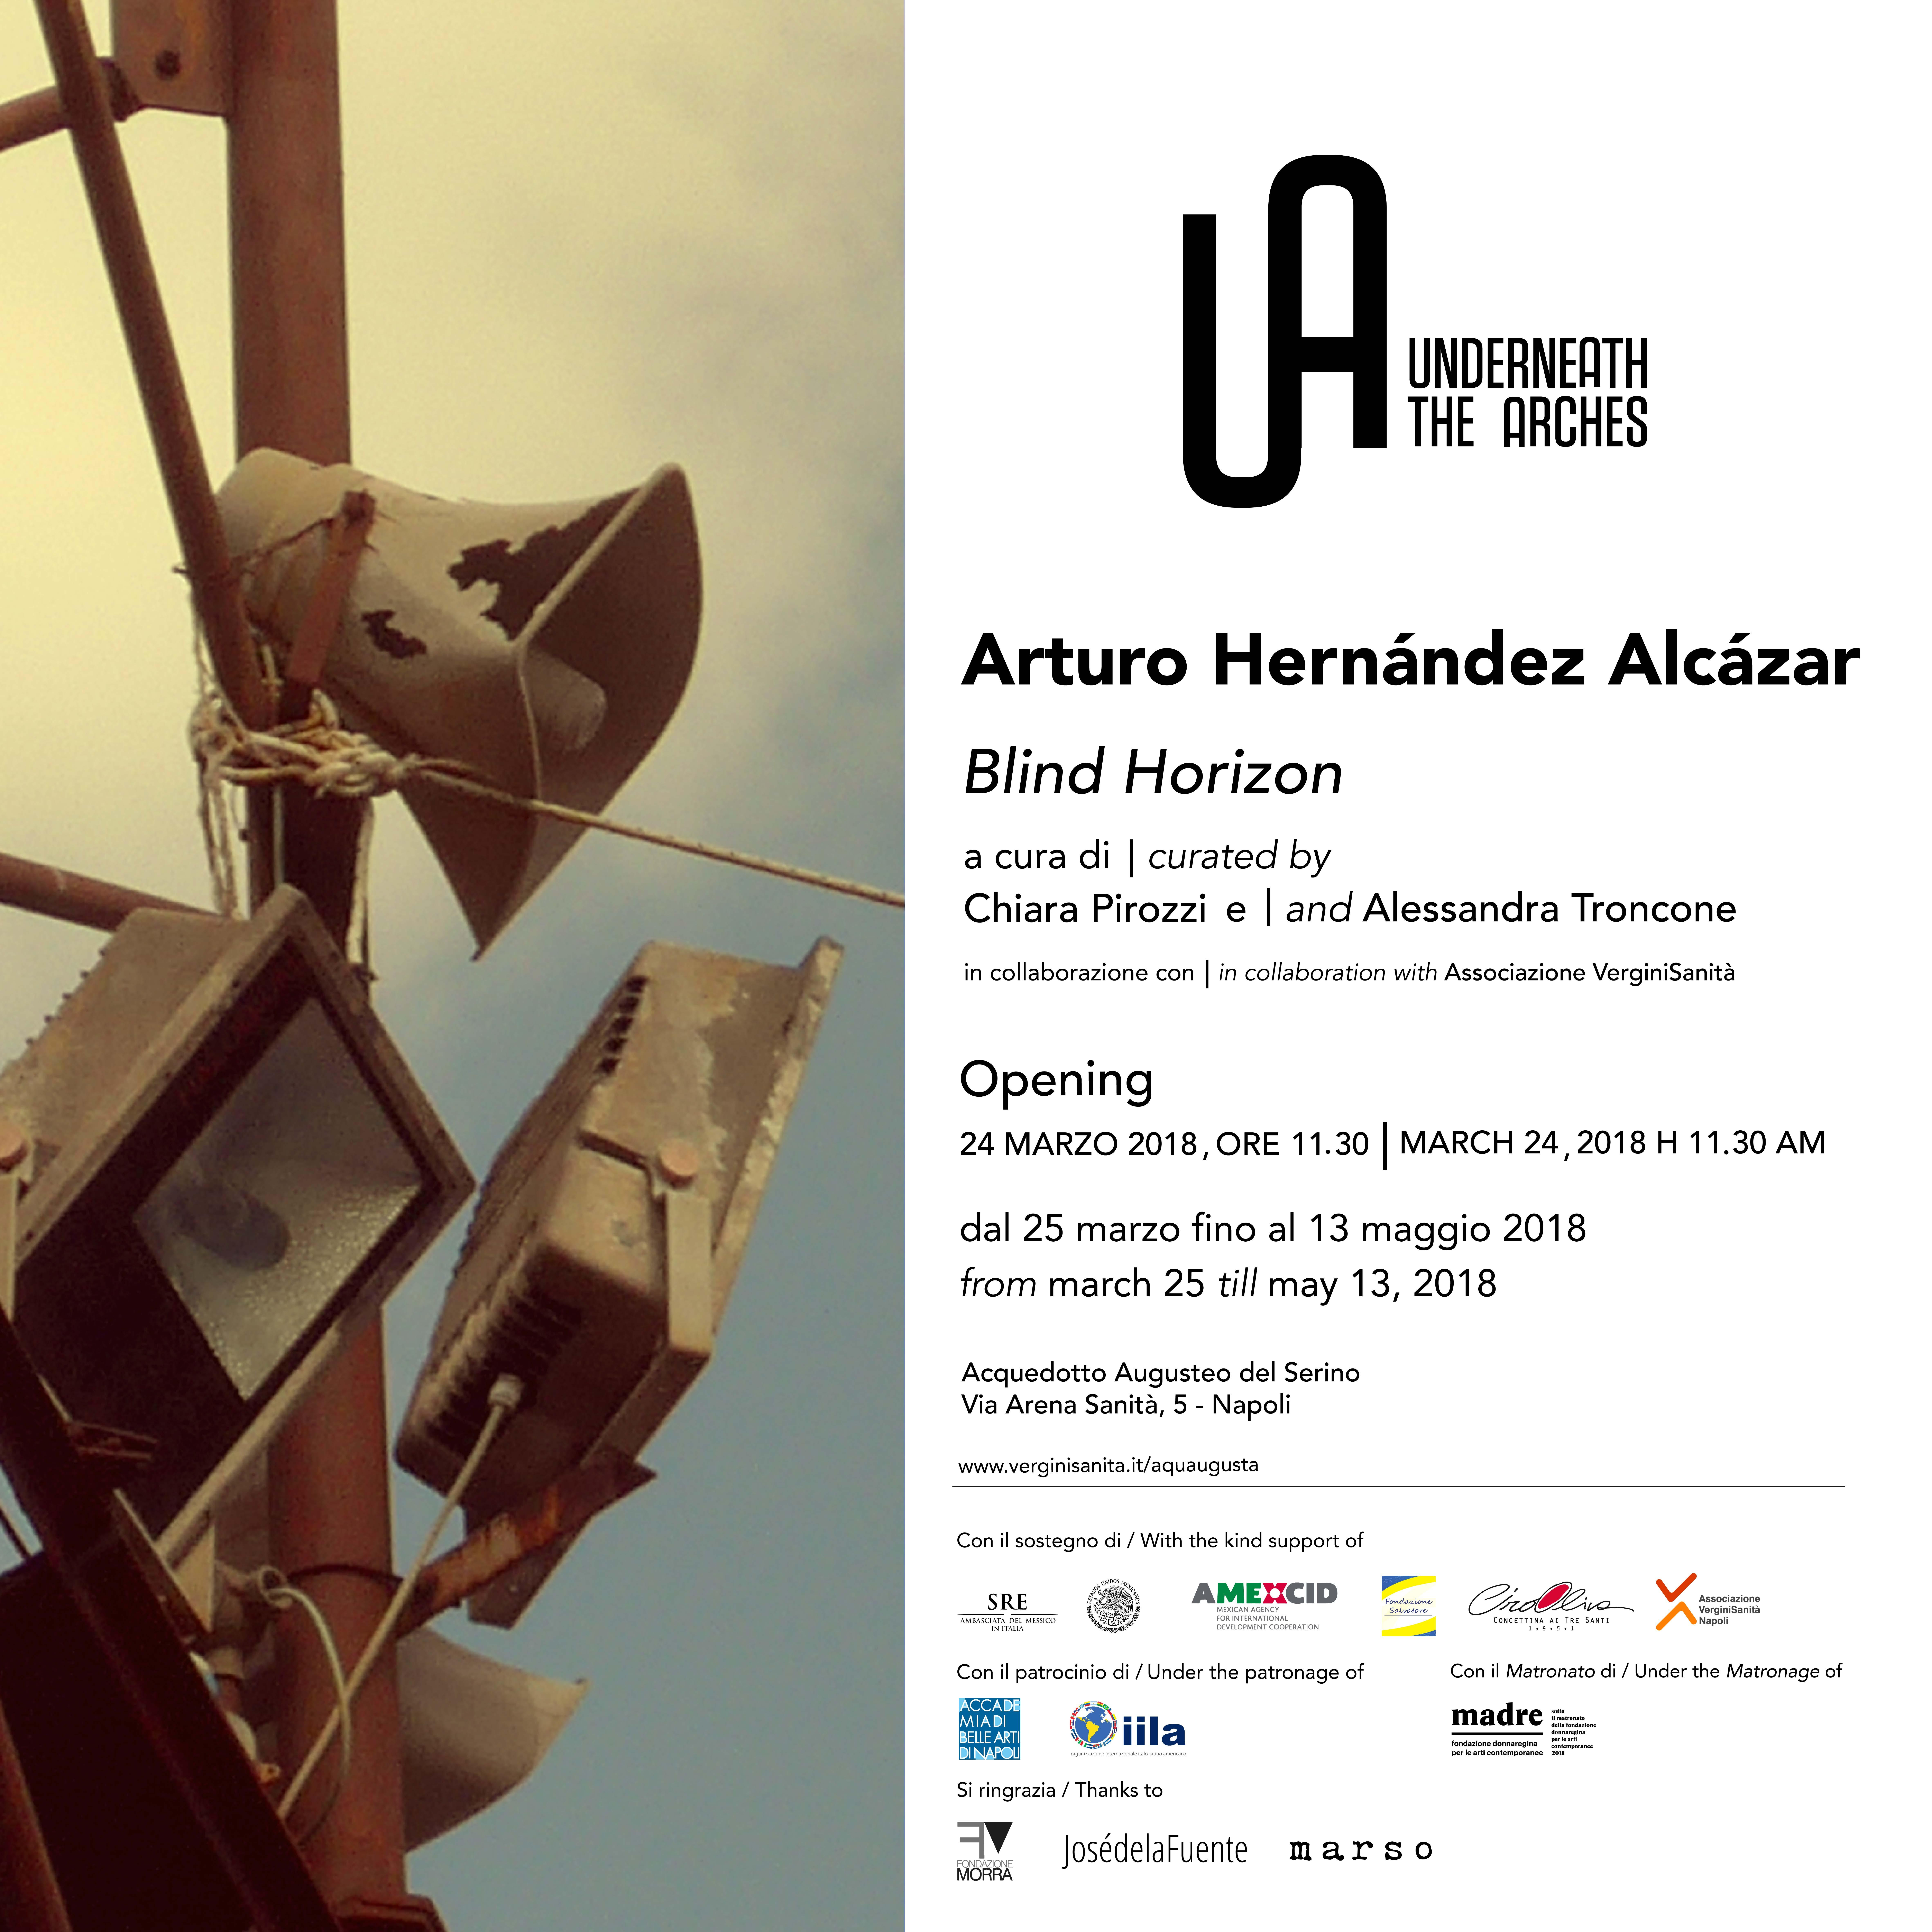 UNDERNEATH THE ARCHES   Arturo Hernández Alcázar – Blind Horizon